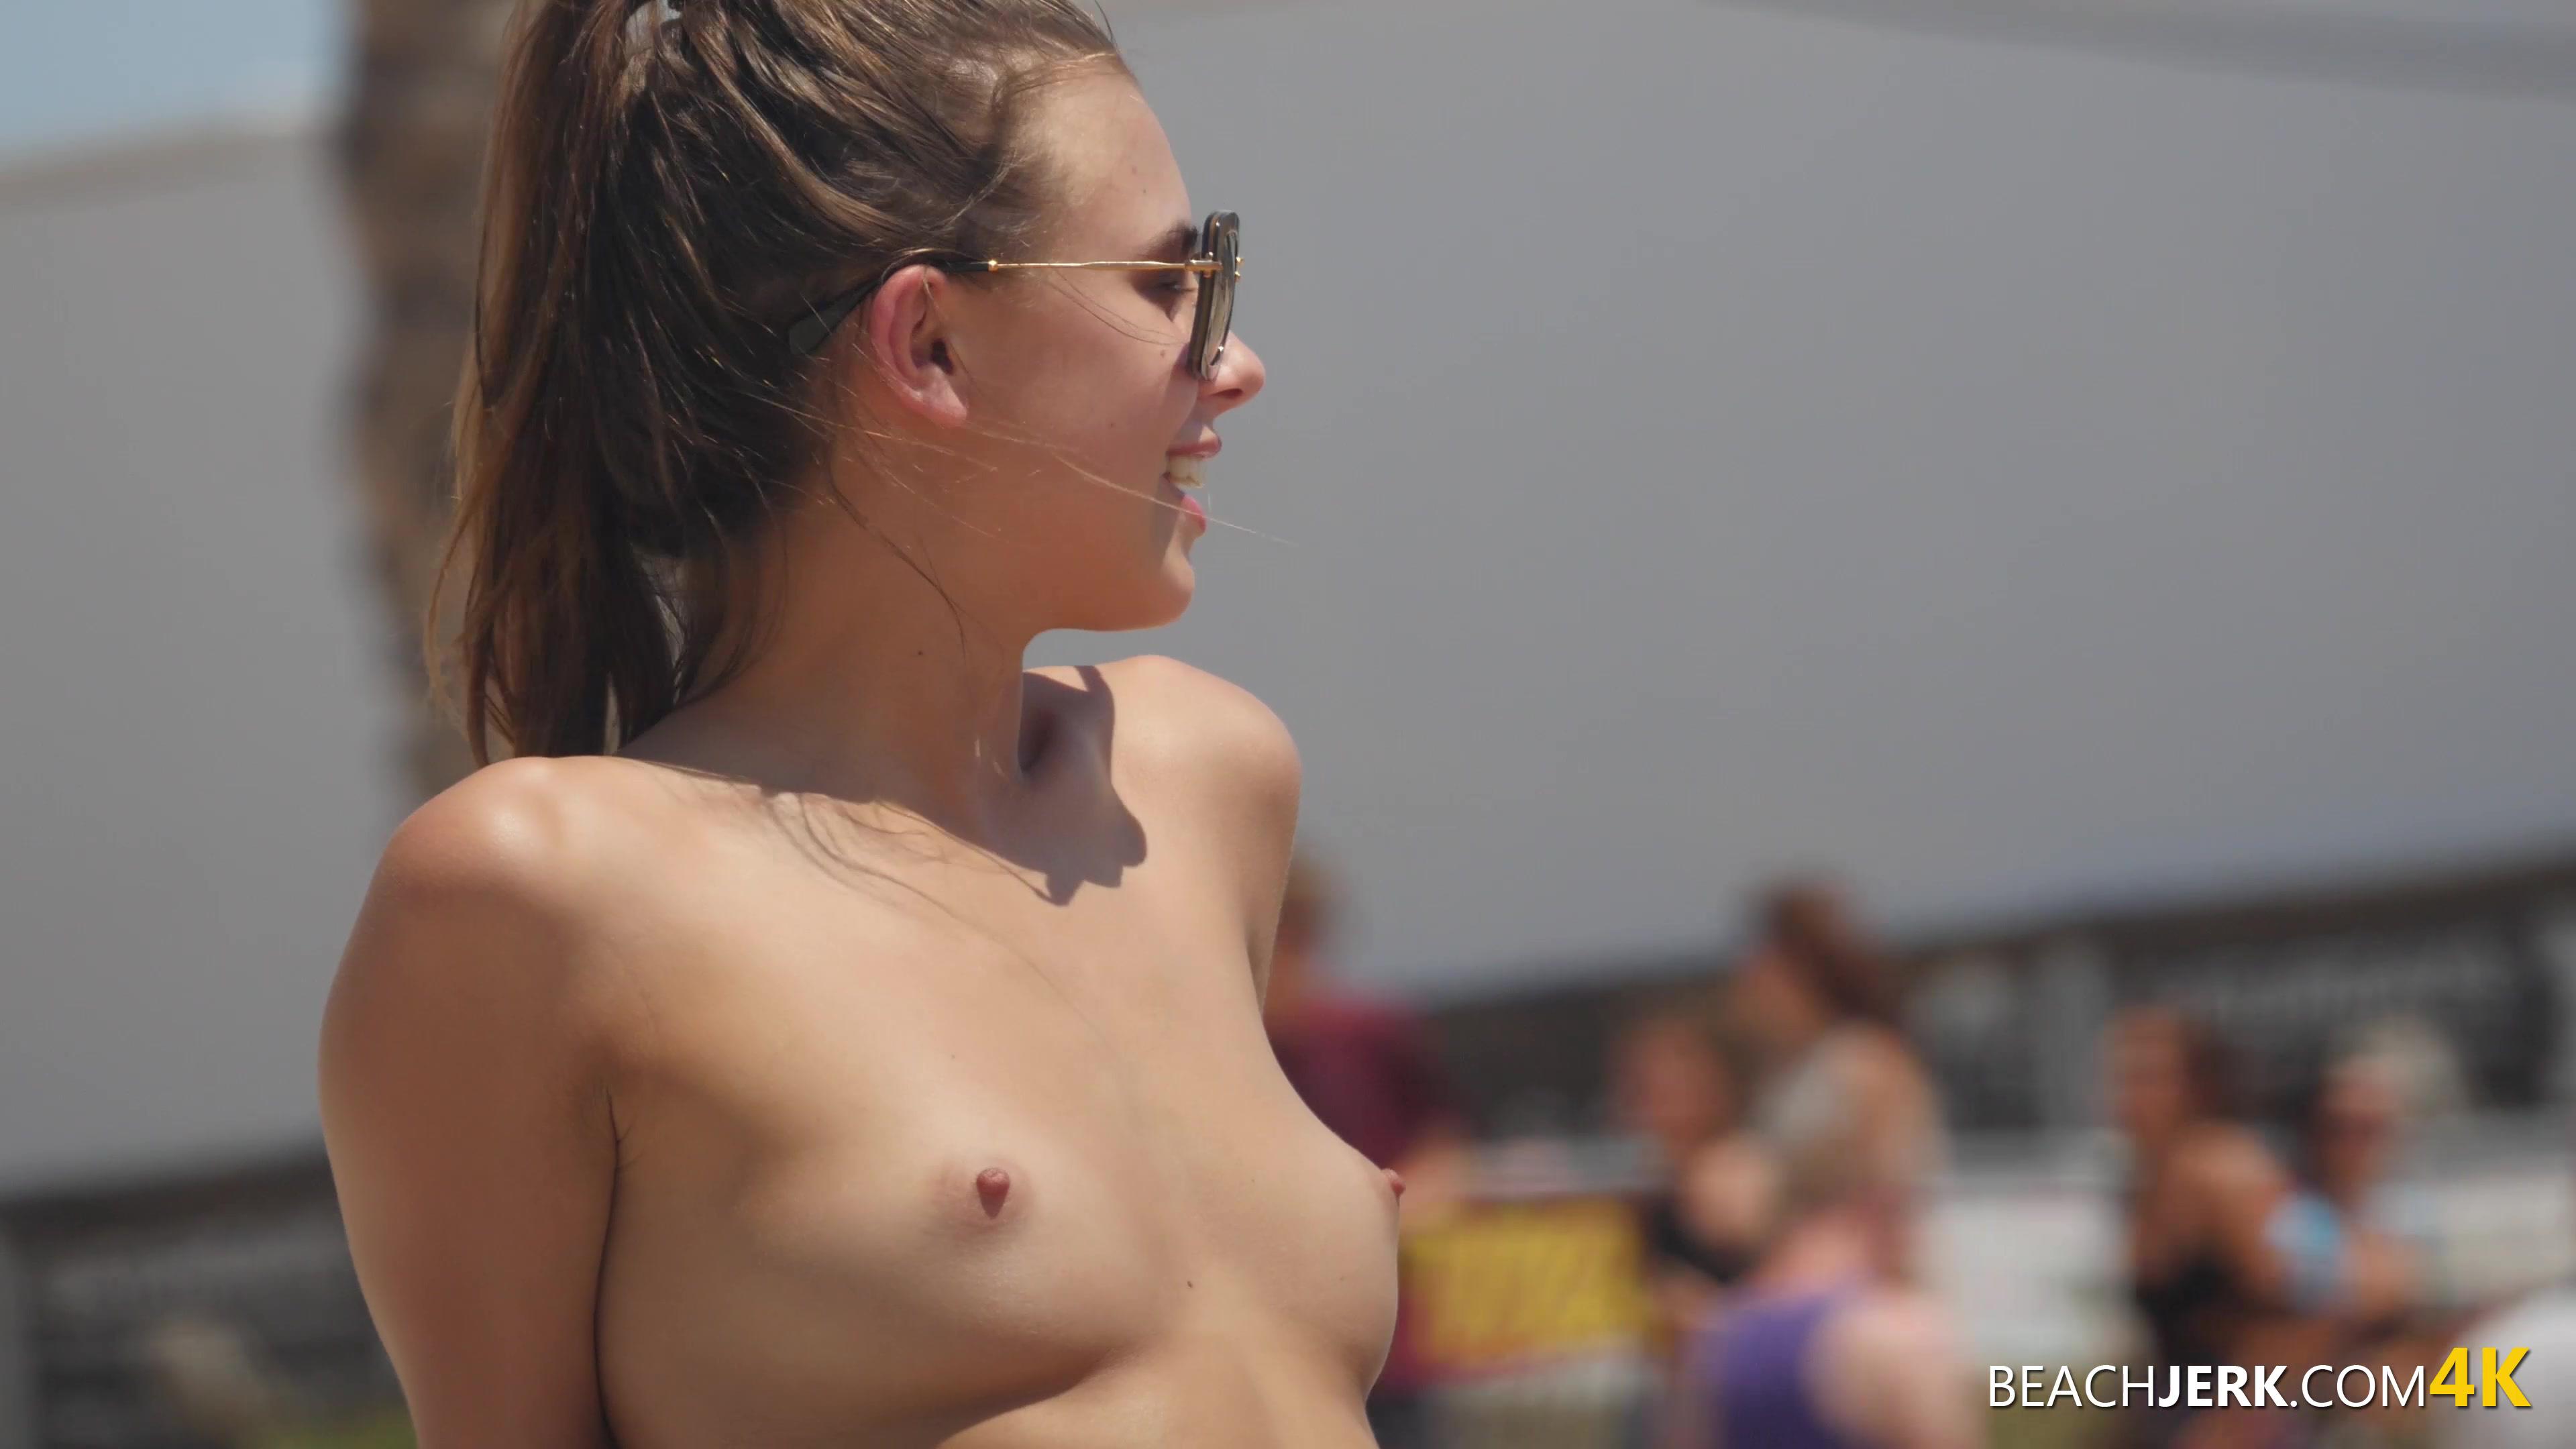 Small tit naturist beauty contest